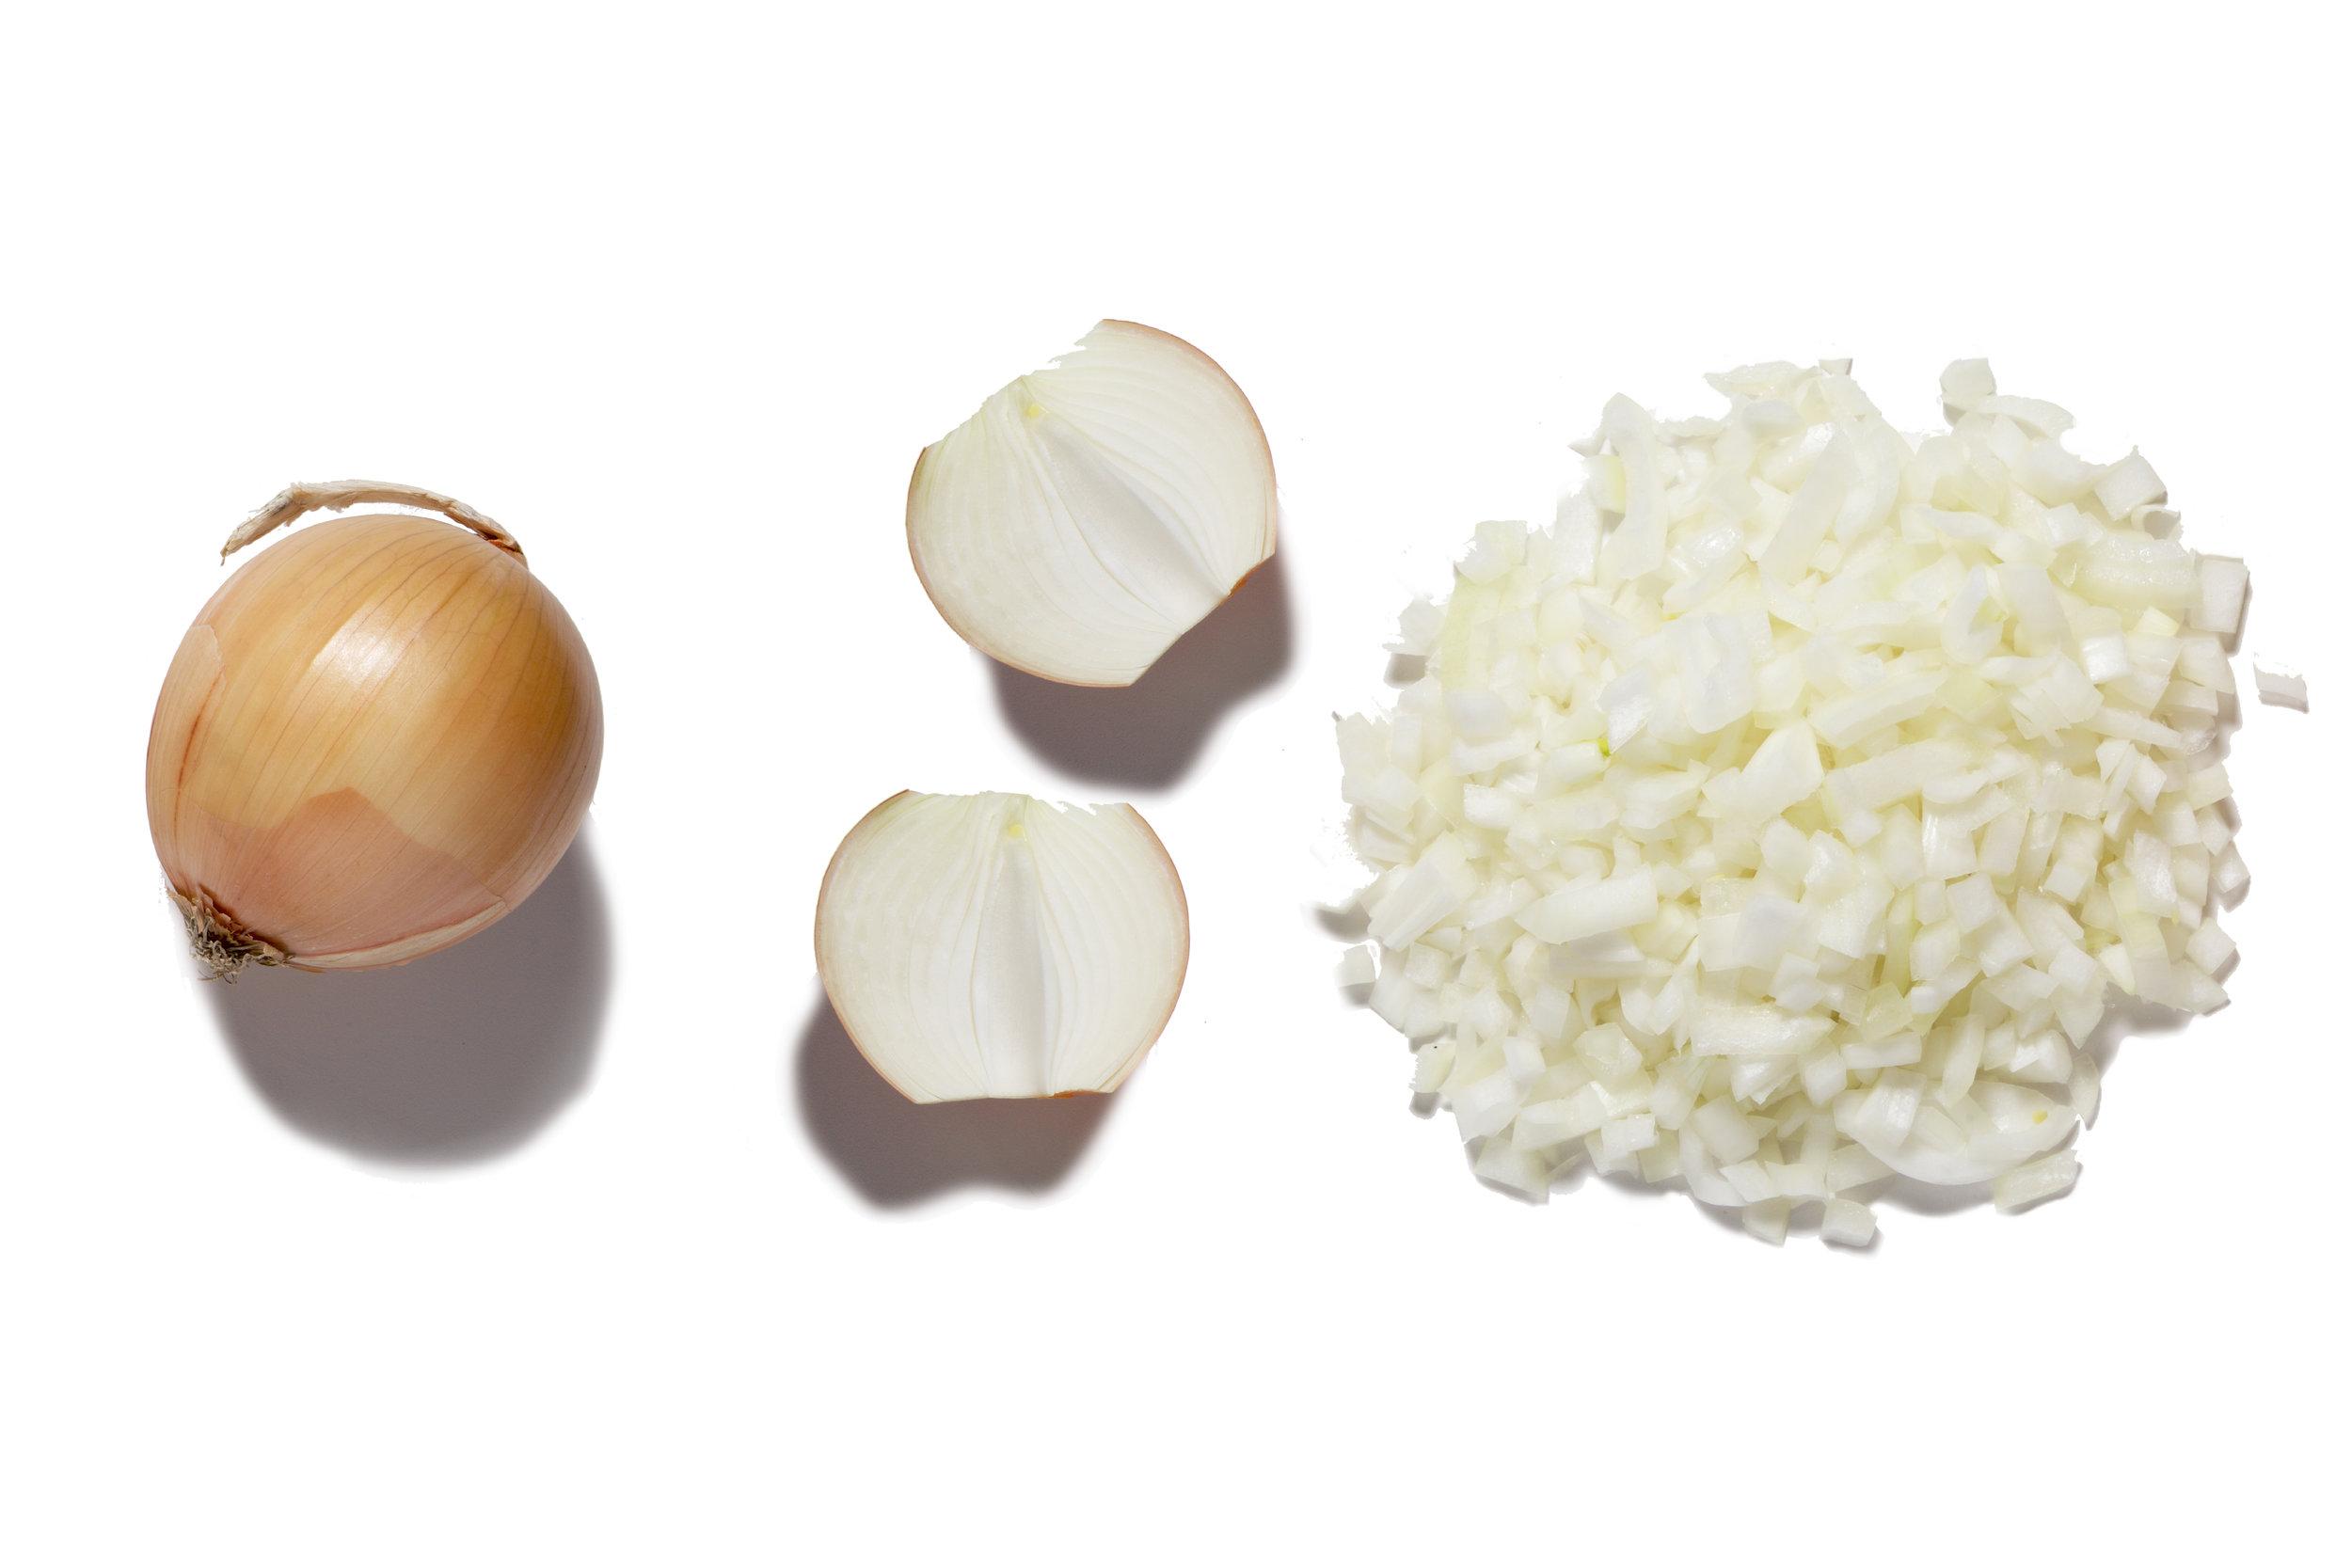 No CutNo CryNo Cook - No GMOs | Gluten Free